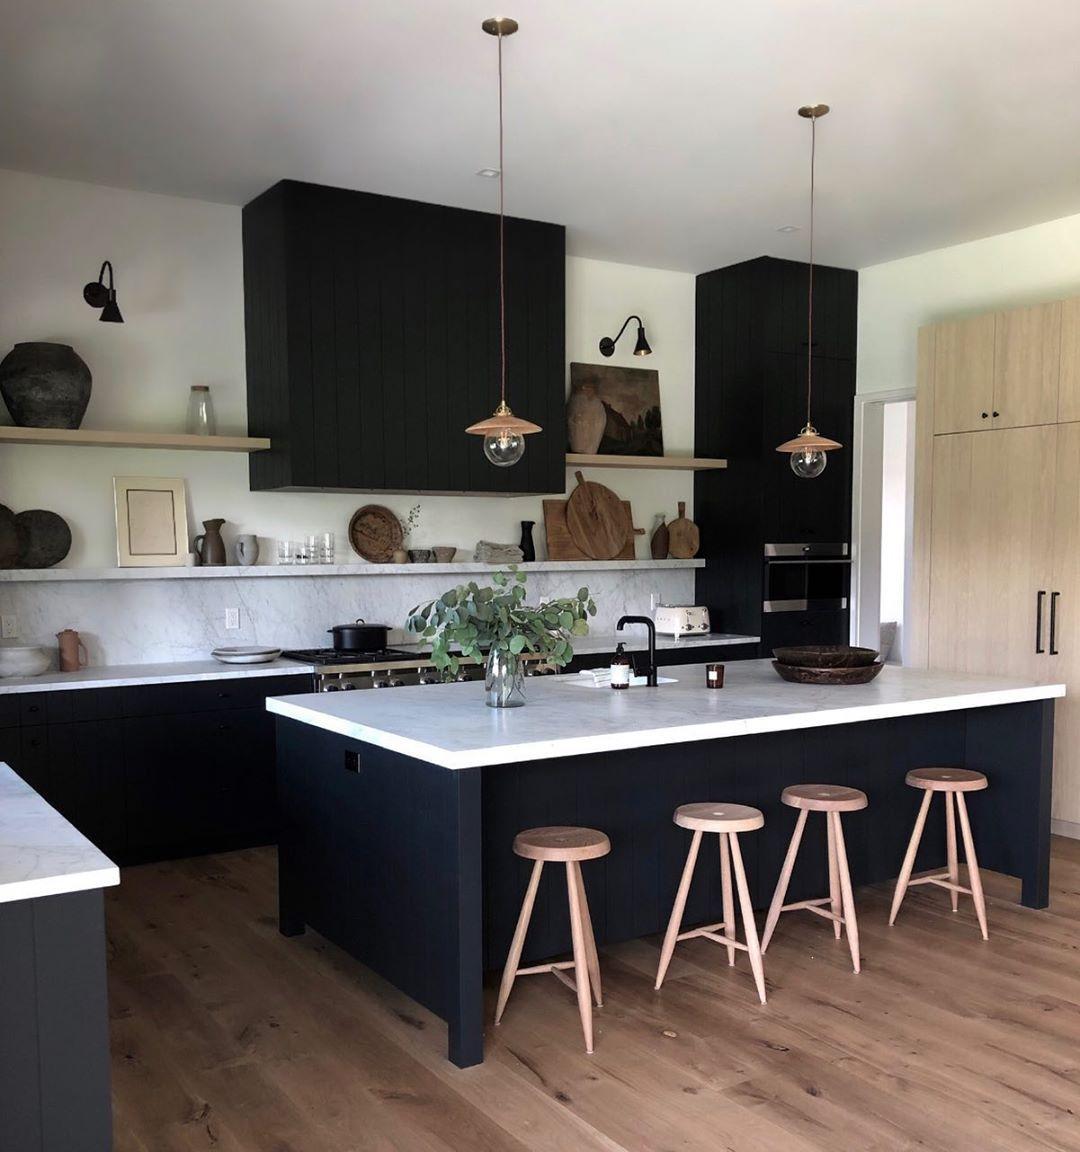 jake arnold interiors on instagram pull up a stool interiordesign green kitchen walls on kitchen interior green id=87602